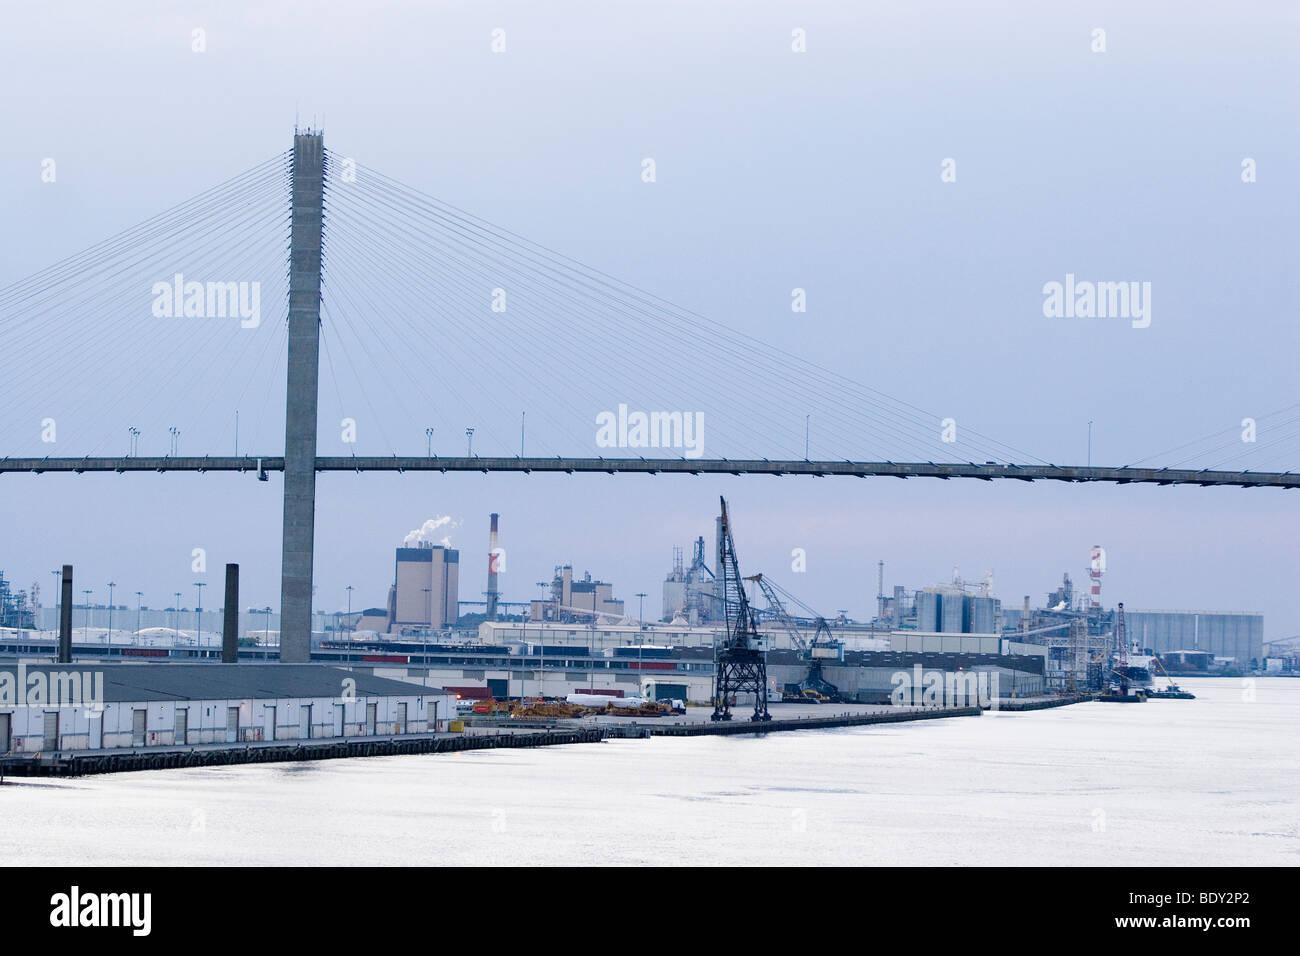 Talmadge Memorial Bridge over the Port of Savannah - Stock Image